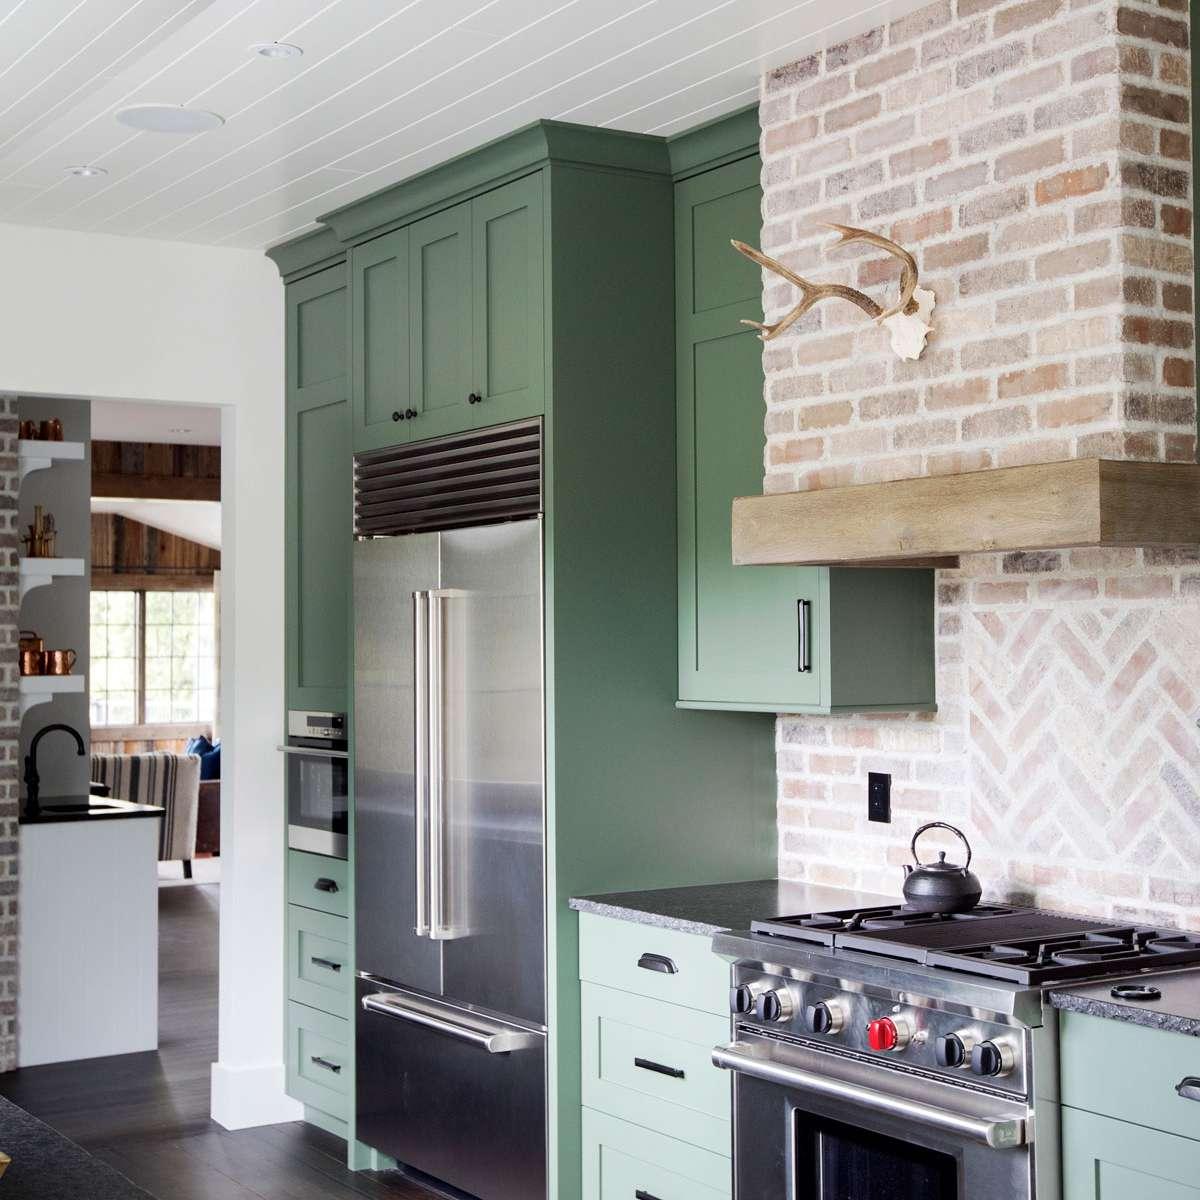 Green kitchen cabinets with brick backsplash